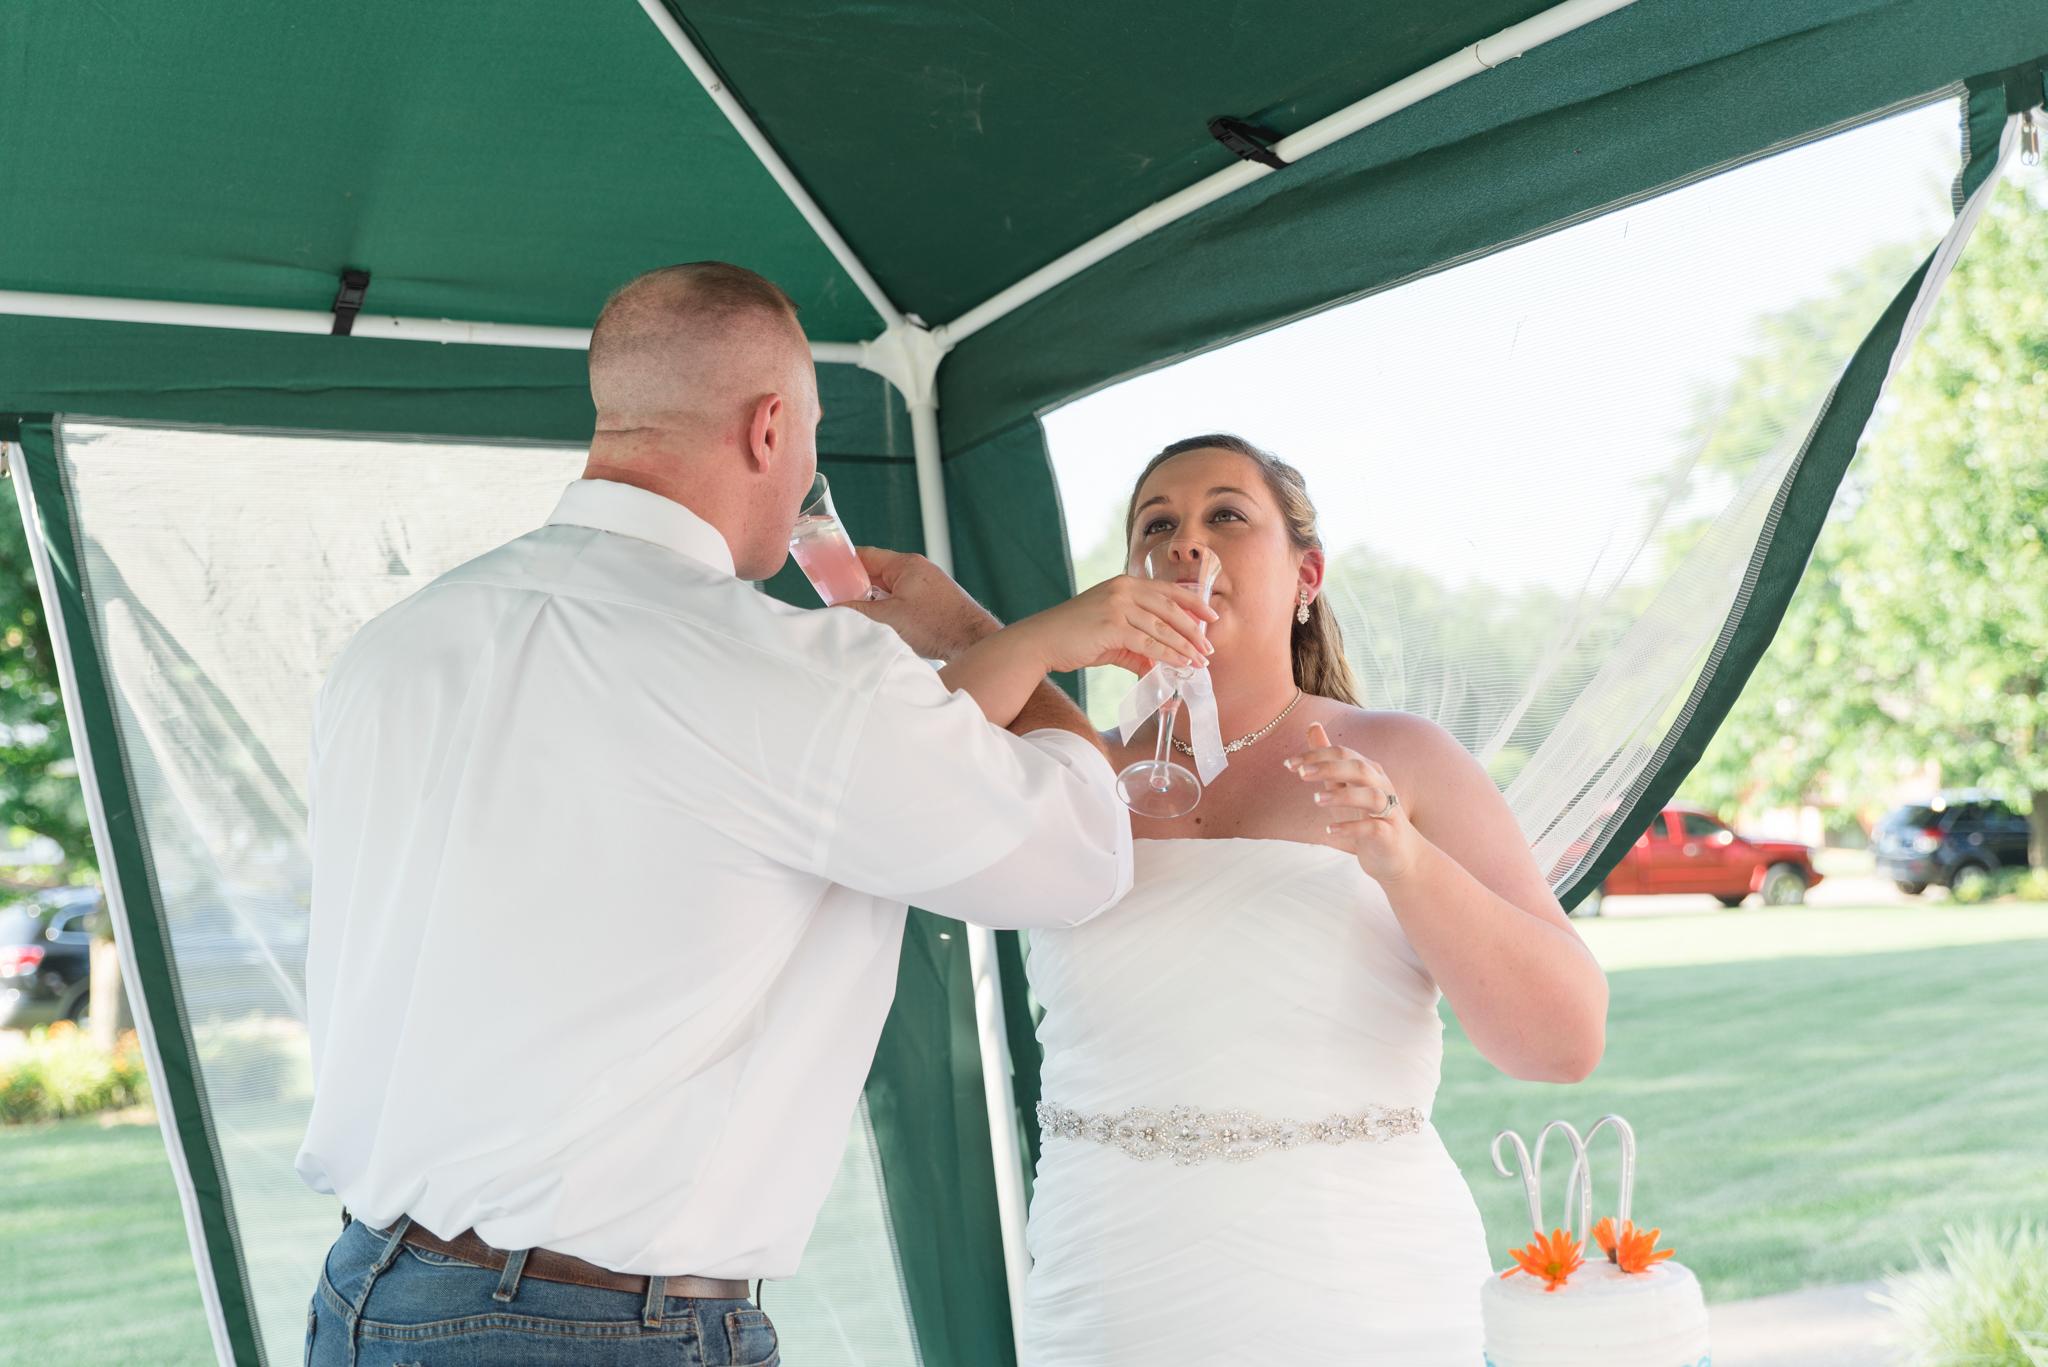 Dry Ridge KY, Dry Ridge KY Wedding Photographer, ky wedding photography, ky bride, ky wedding photographer, kentucky